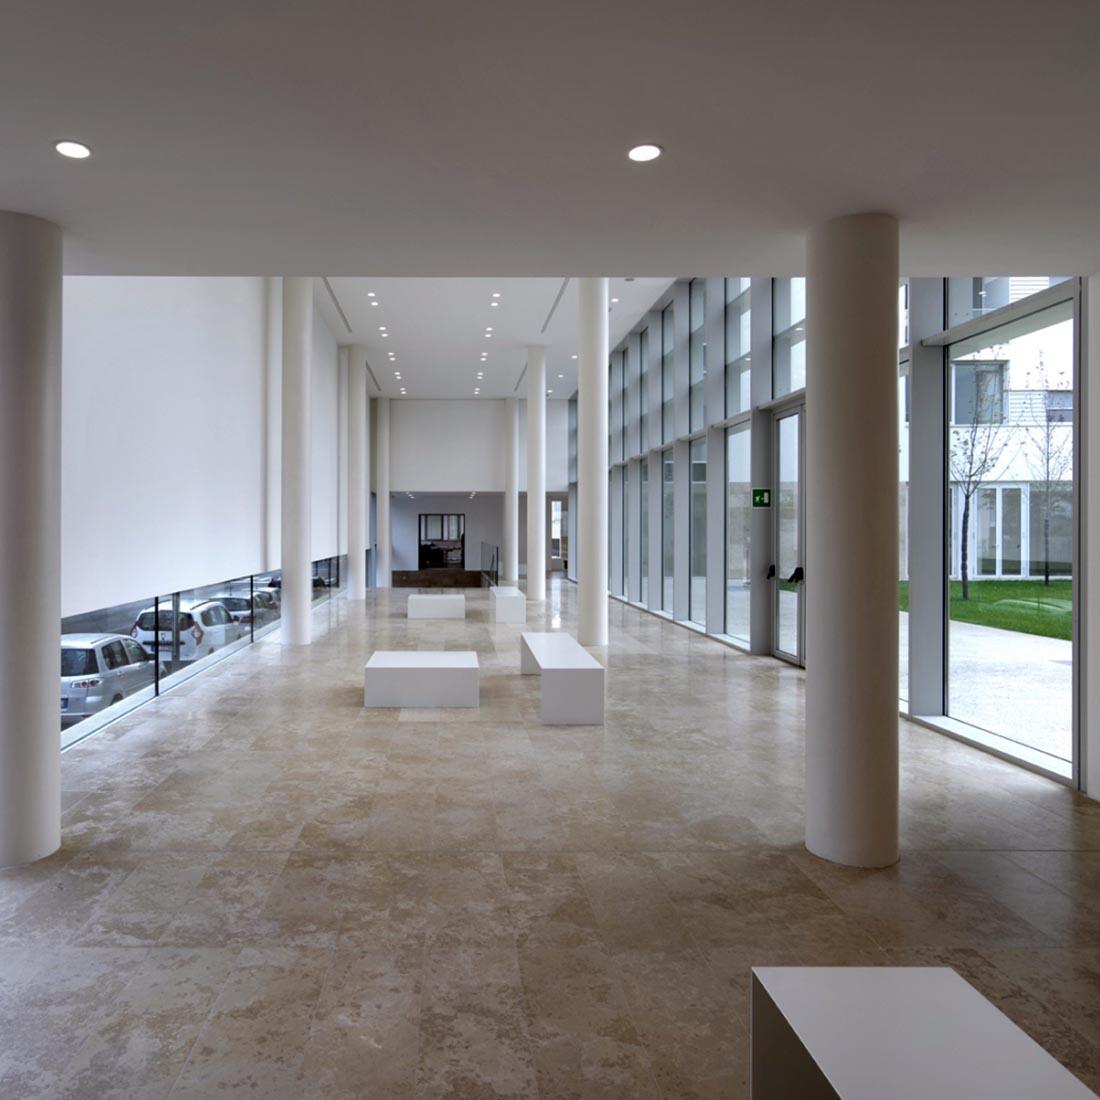 Residenze universitarie Bocconi in viale Isonzo a Milano - L'atrio